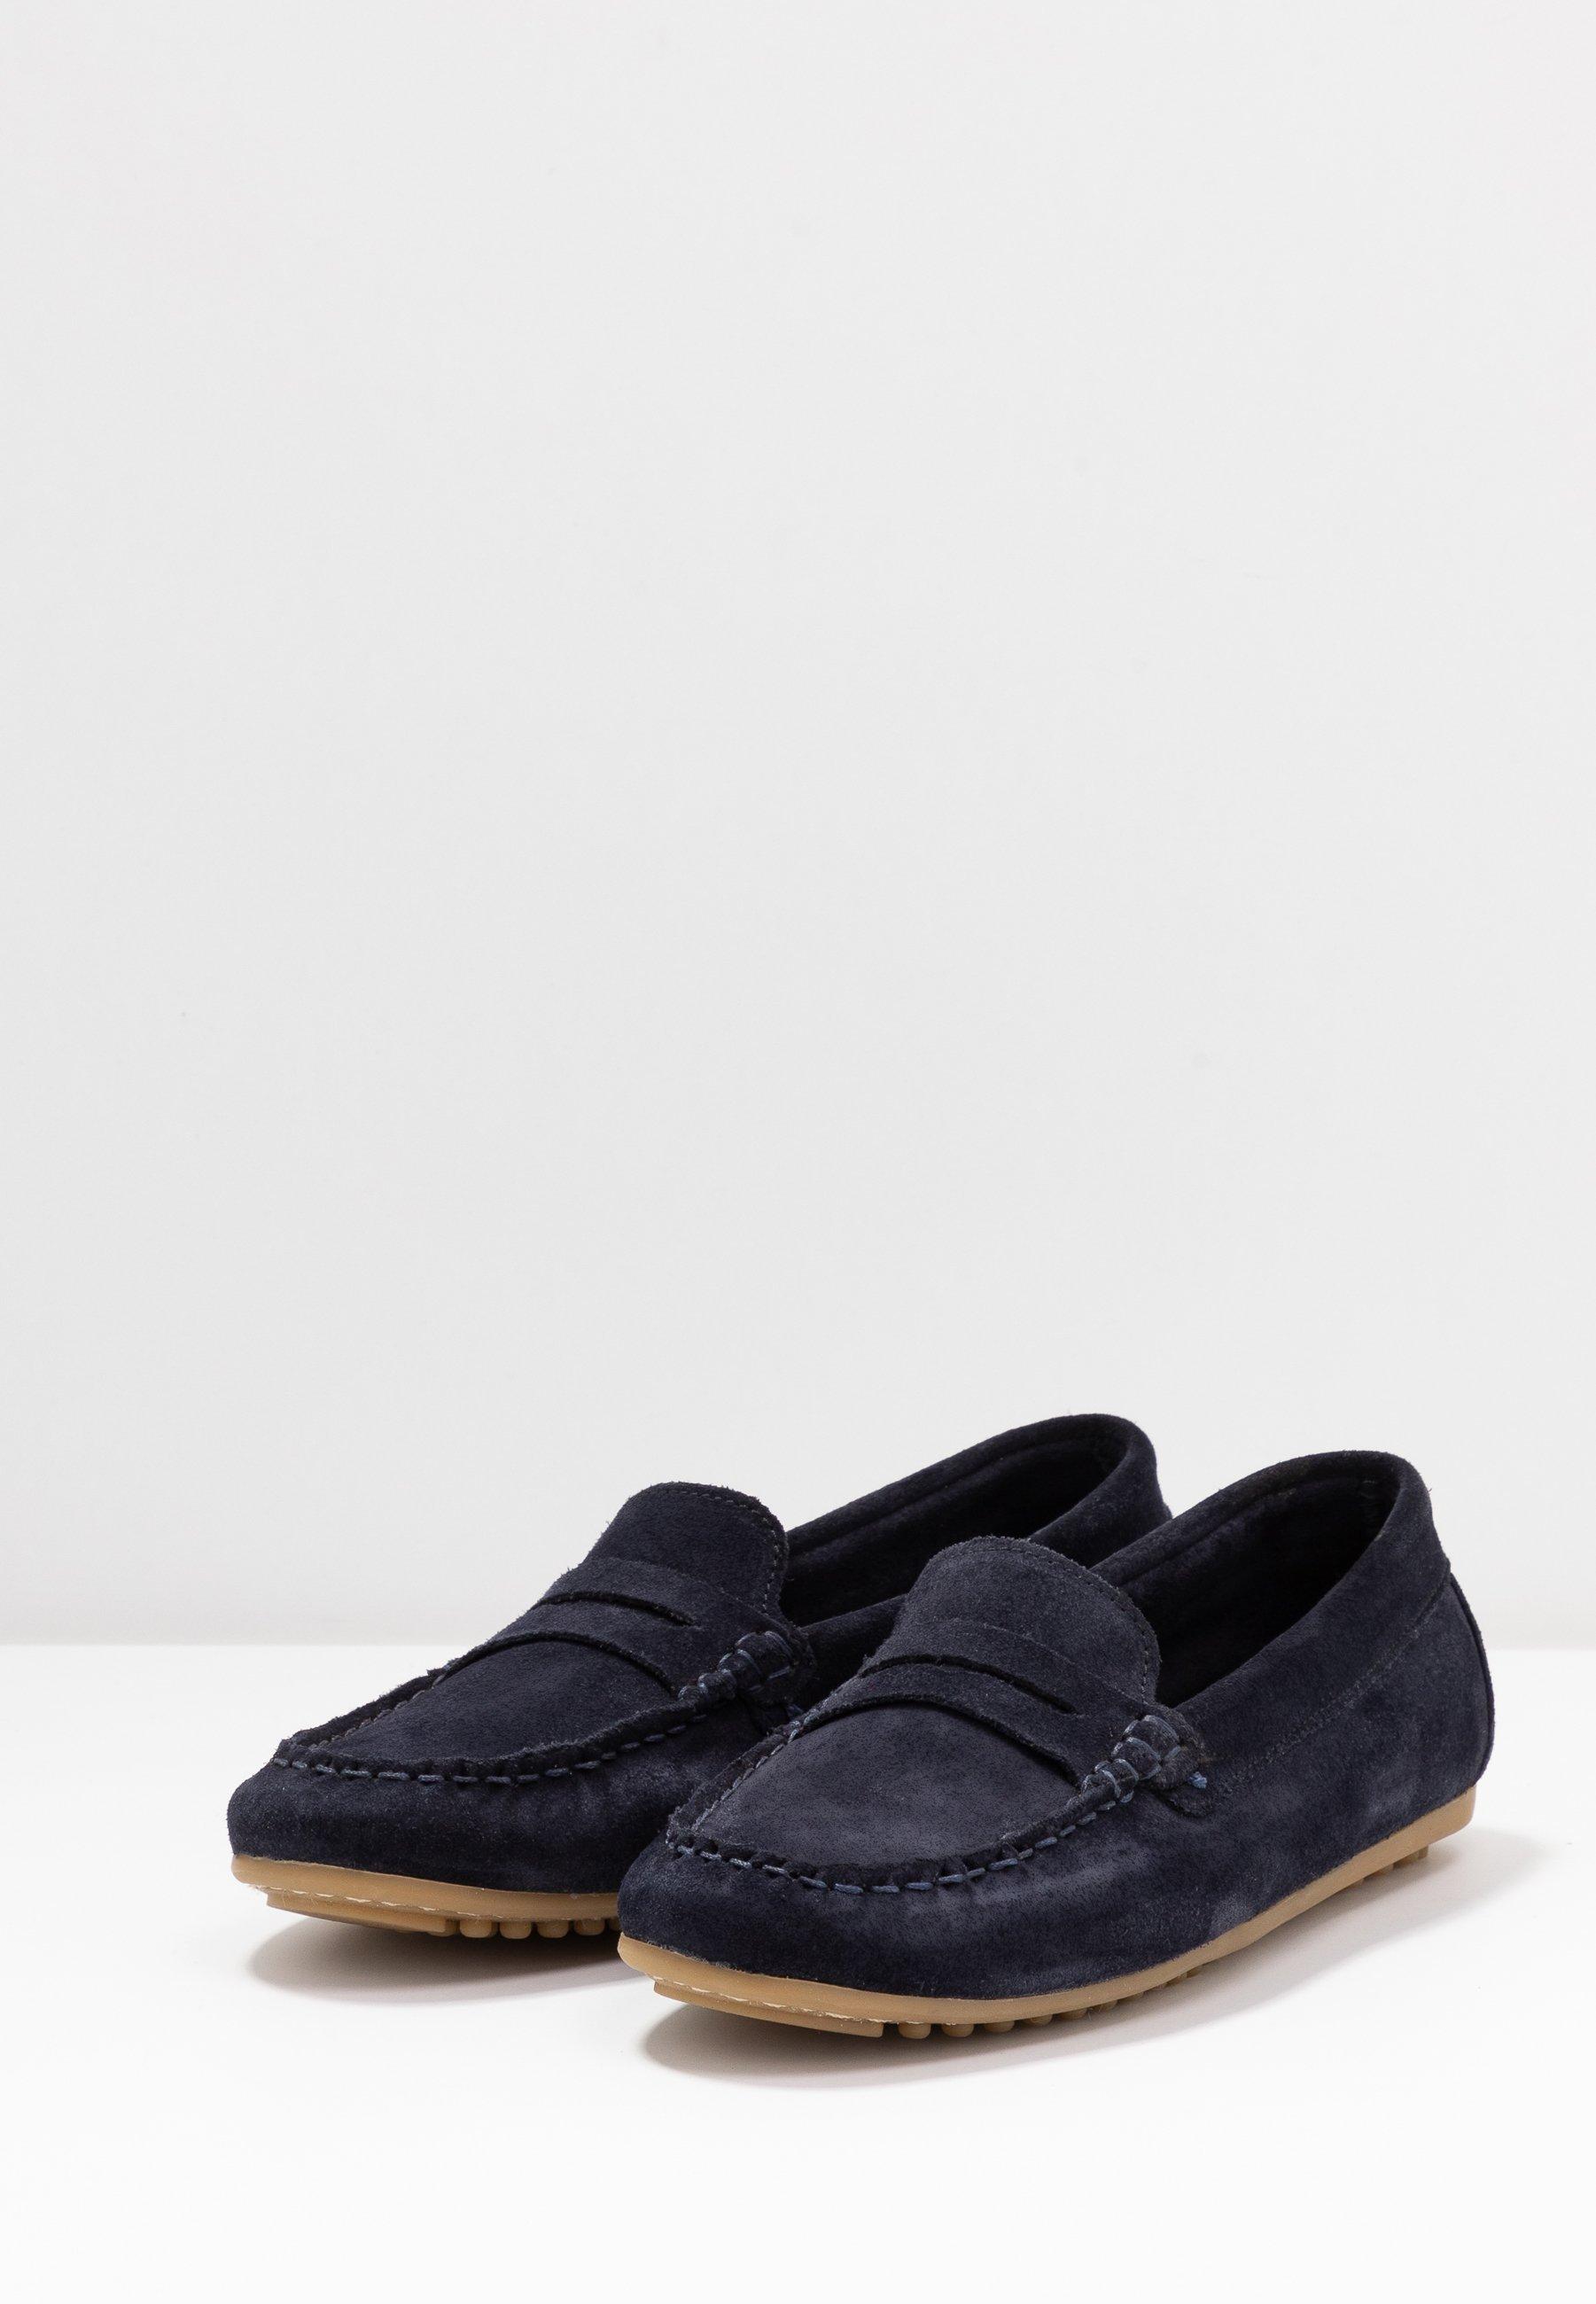 Anna Field Leather Moccasins - Mokkasiner Blue